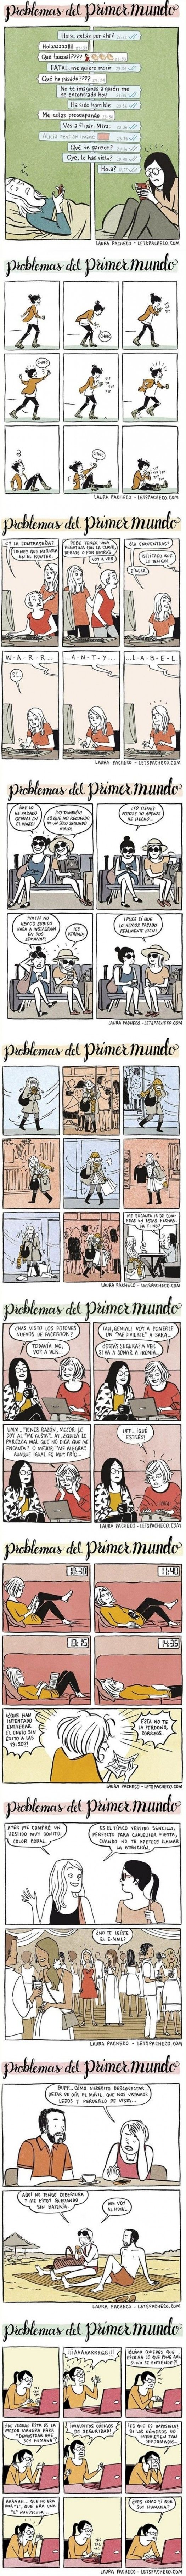 Problemas Del Primer Mundo Emosional Pinterest